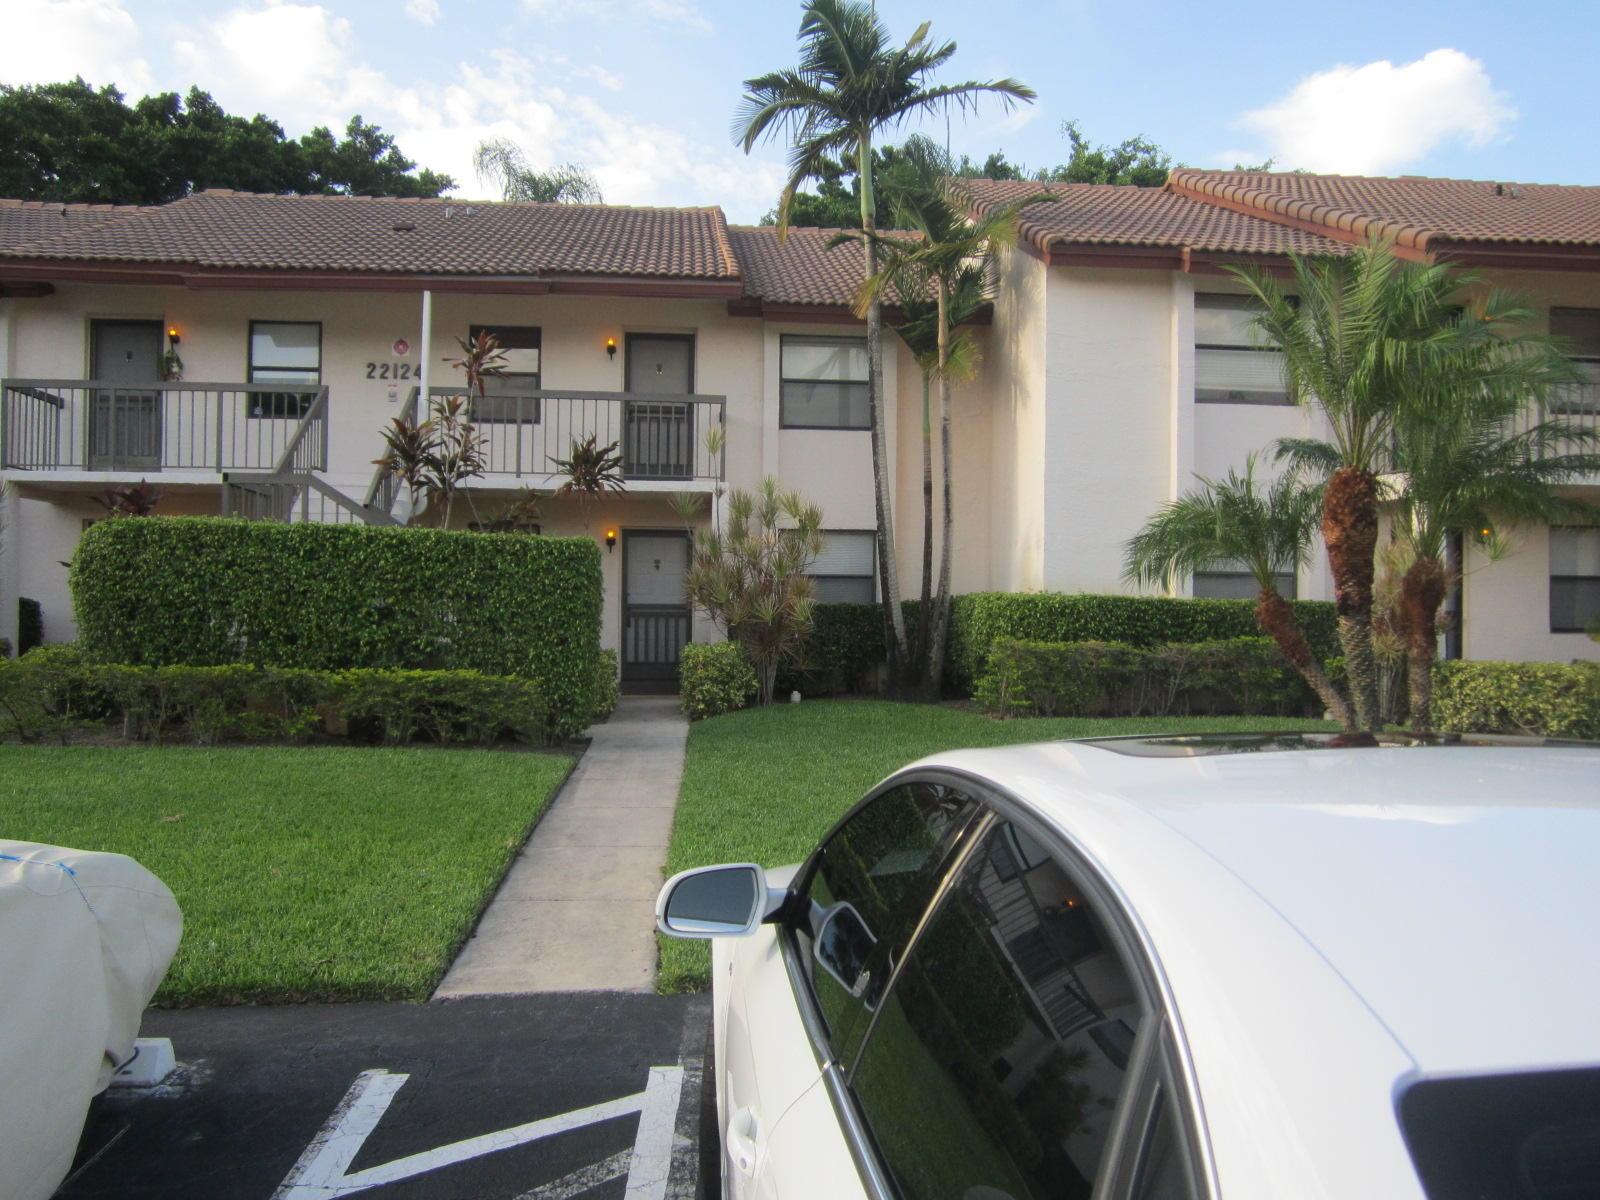 22124 Palms Way 104  Boca Raton FL 33433